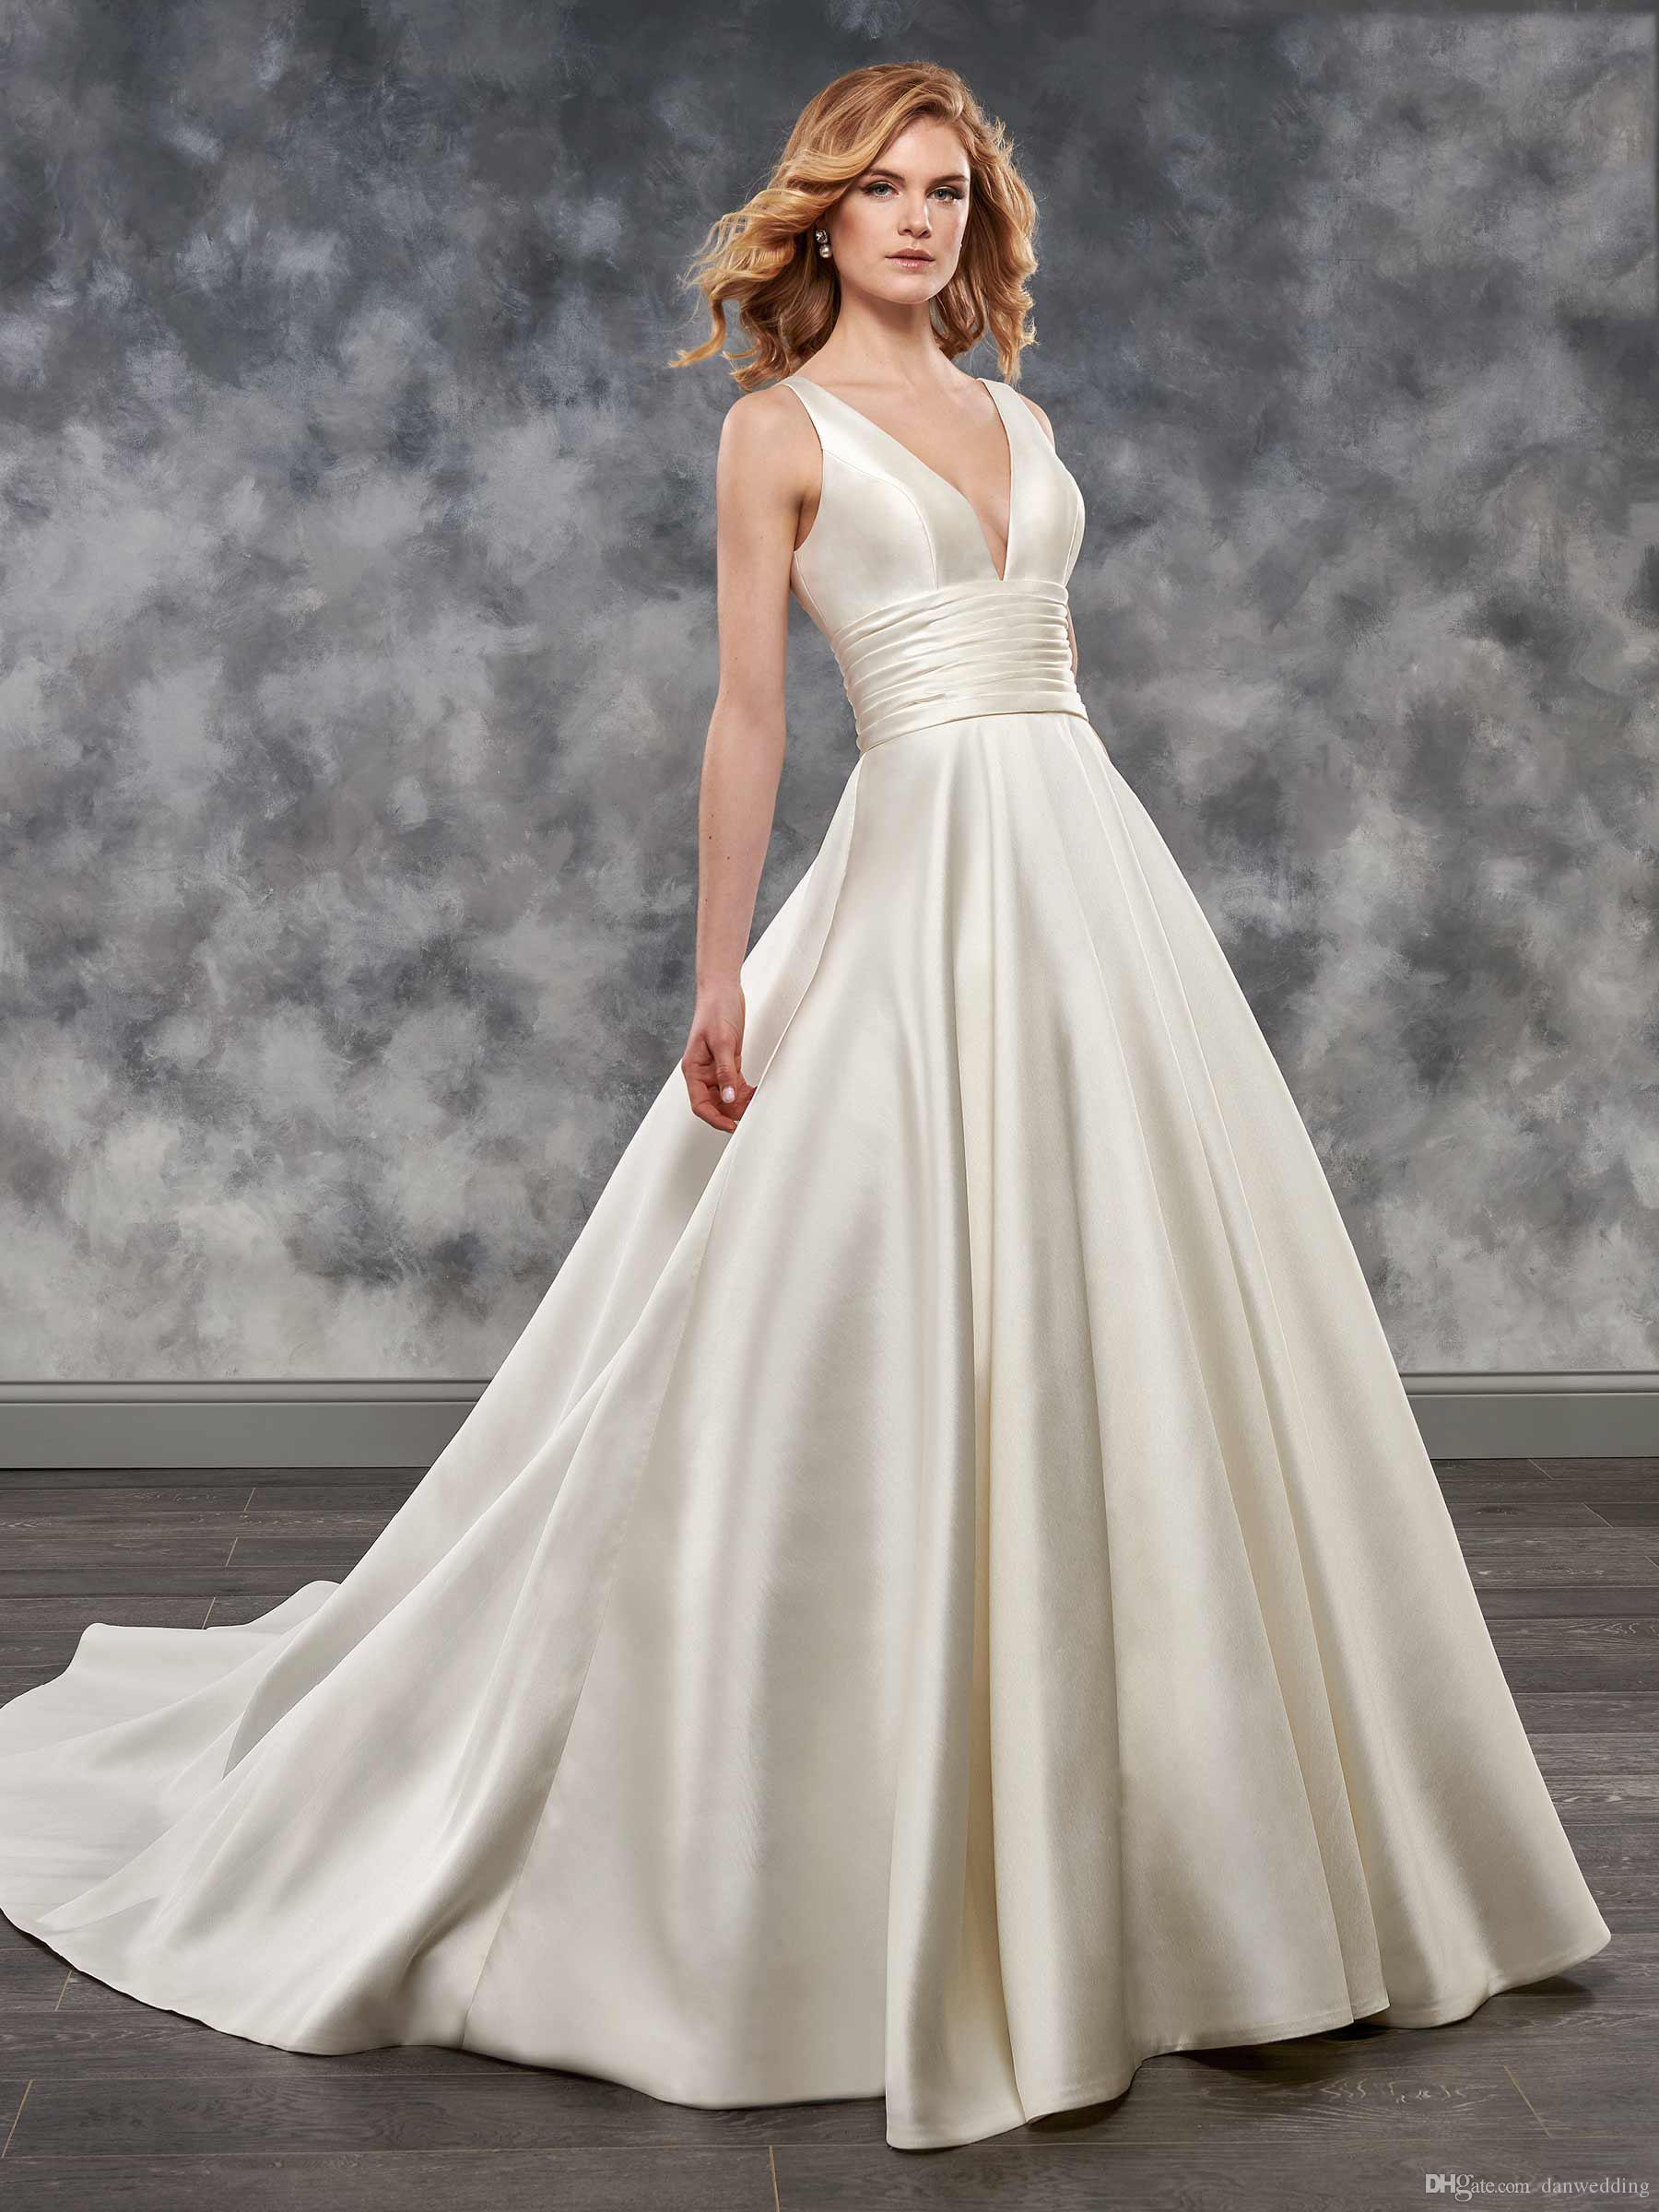 Grace Ivoire Satin Col V-Col V - Robes de mariée A-Line Robes de mariée Robes de mariage Robes de mariage Taille personnalisée 2-16 kf1014132